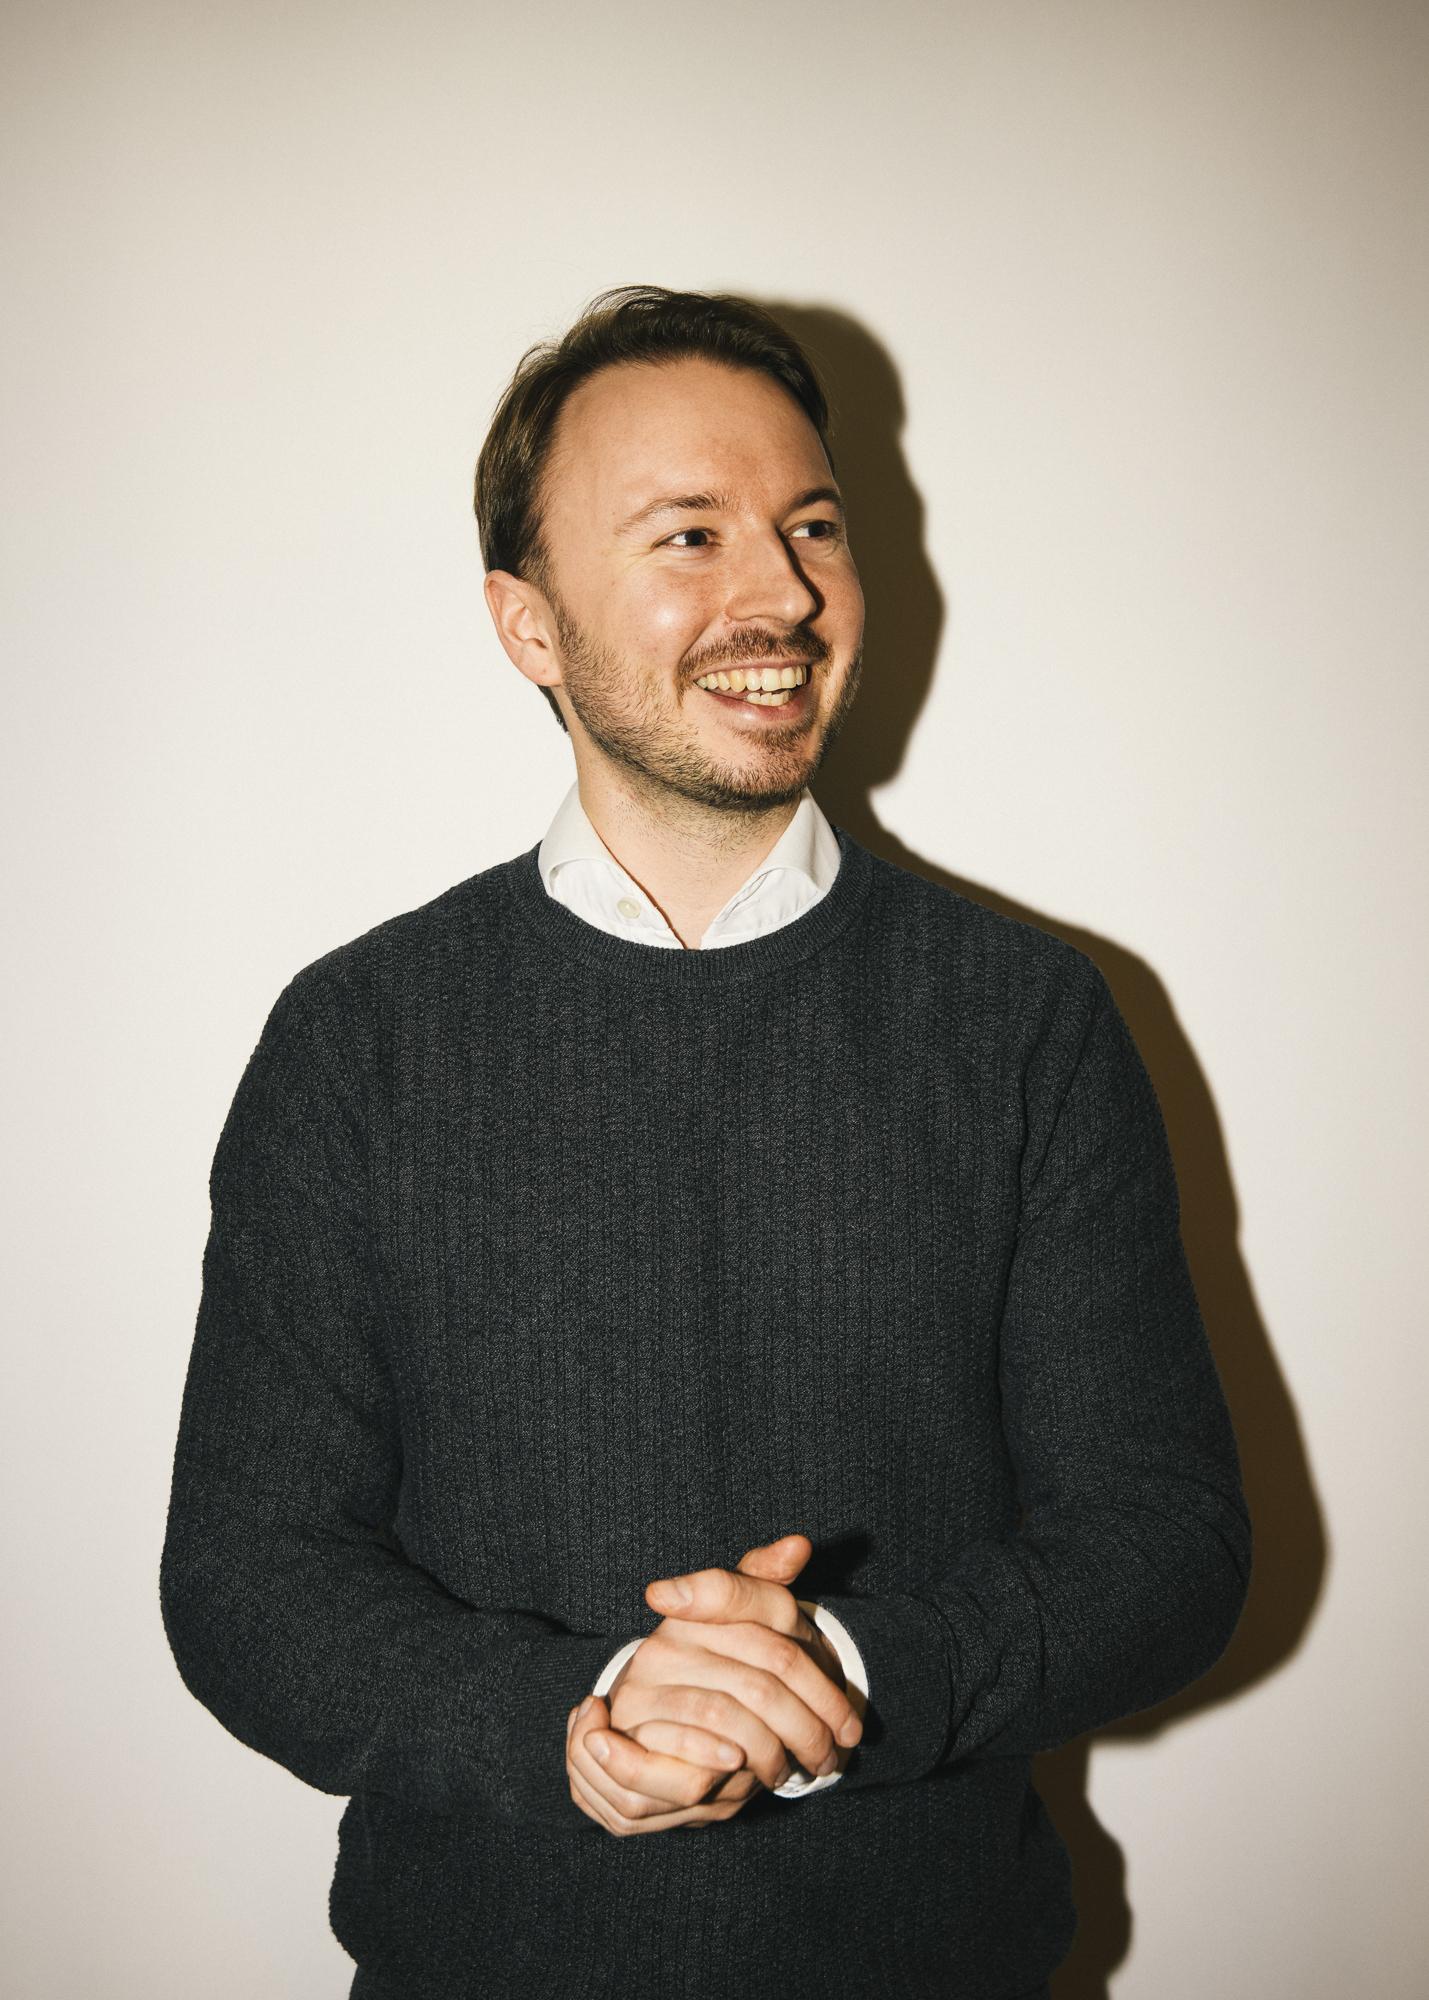 Martin Bratterud